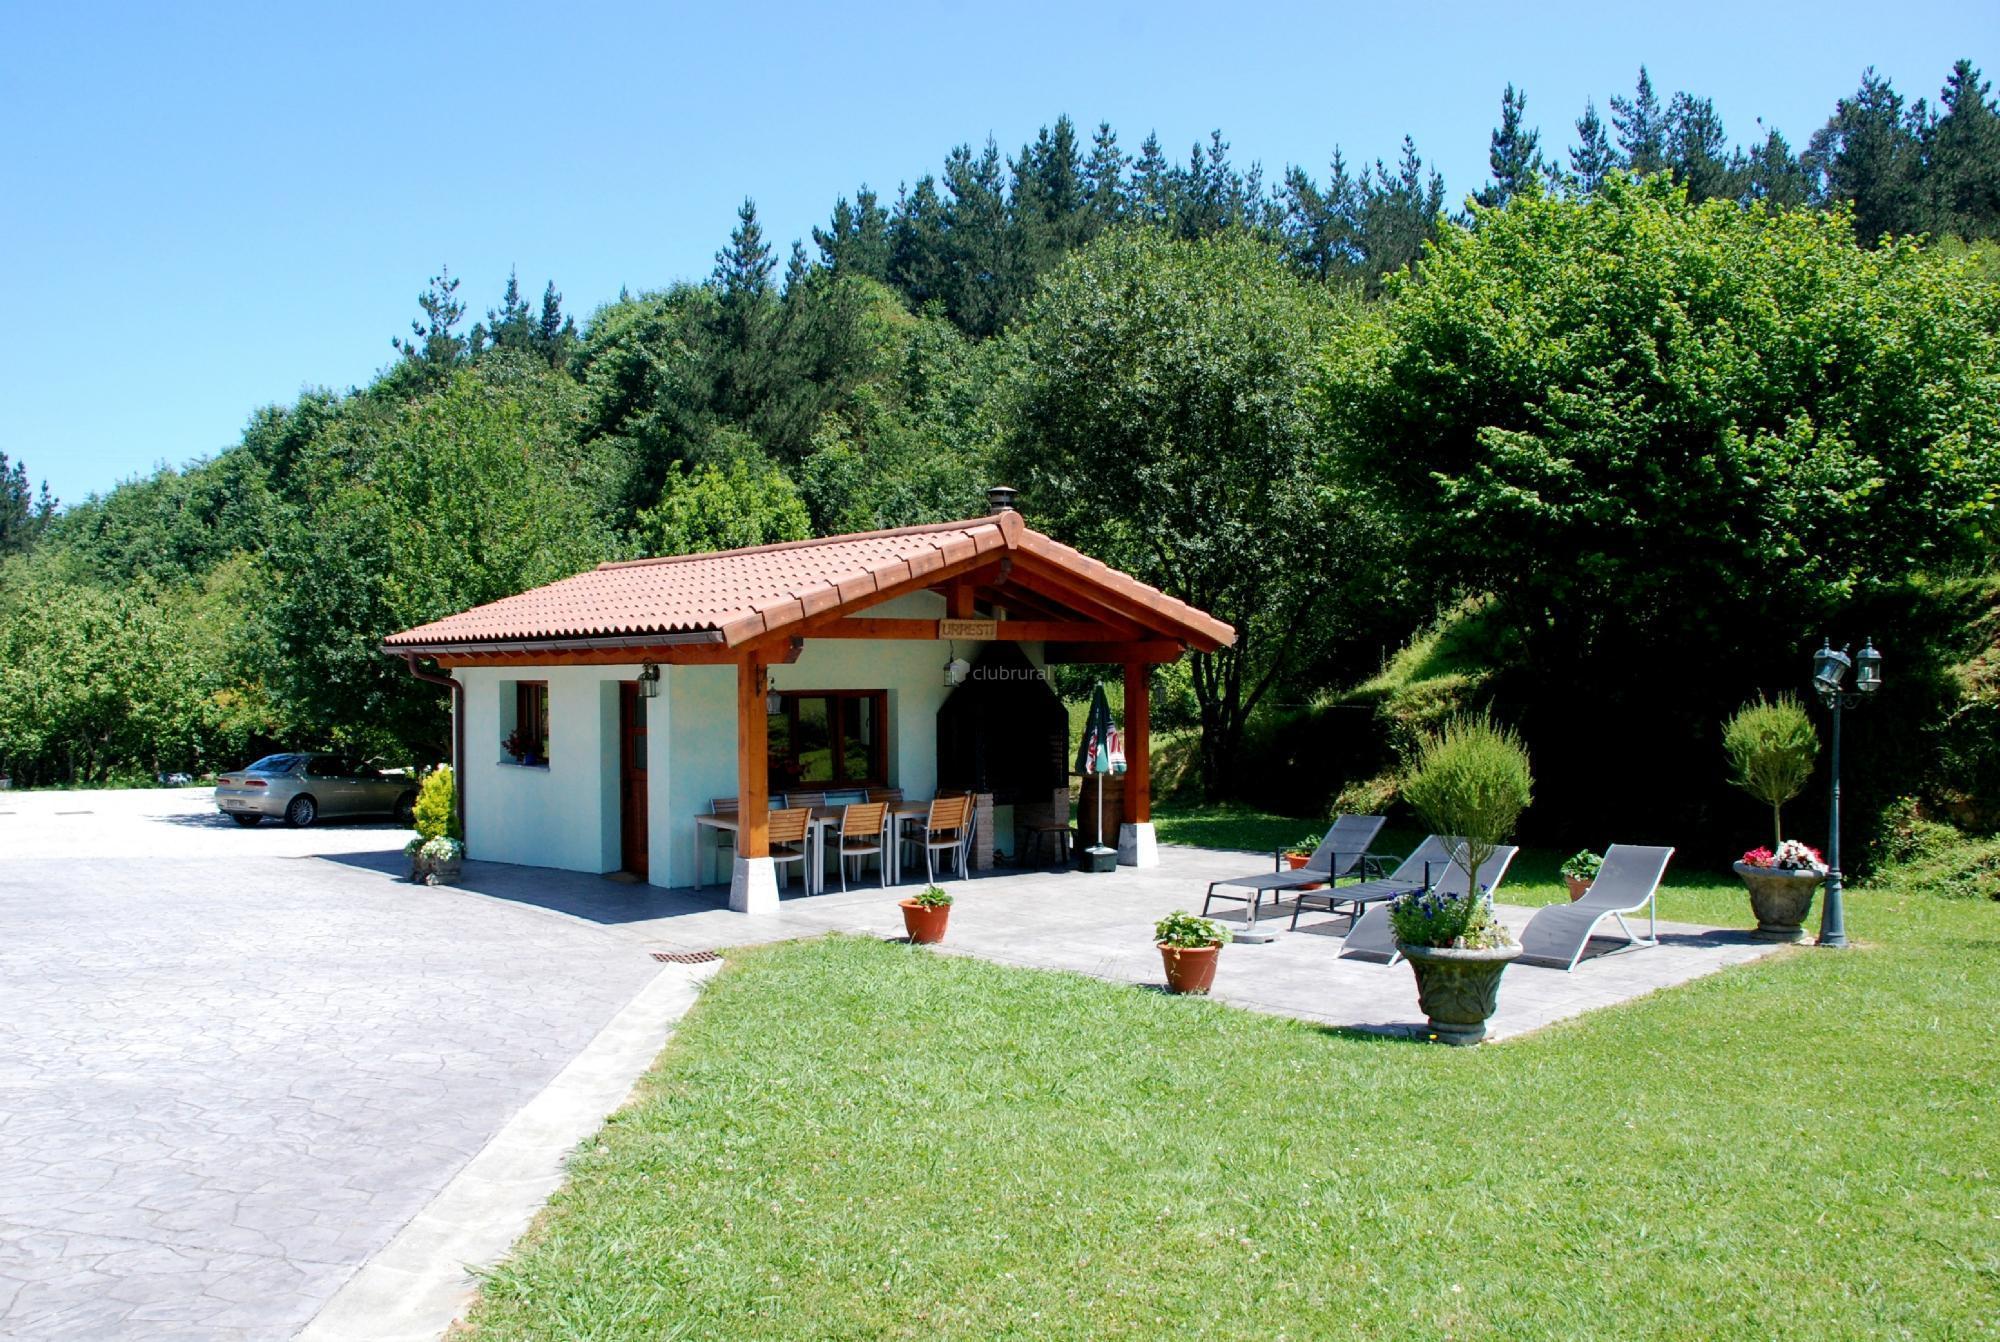 Fotos de caserio urresti vizcaya gautegiz arteaga - Caserios pais vasco ...